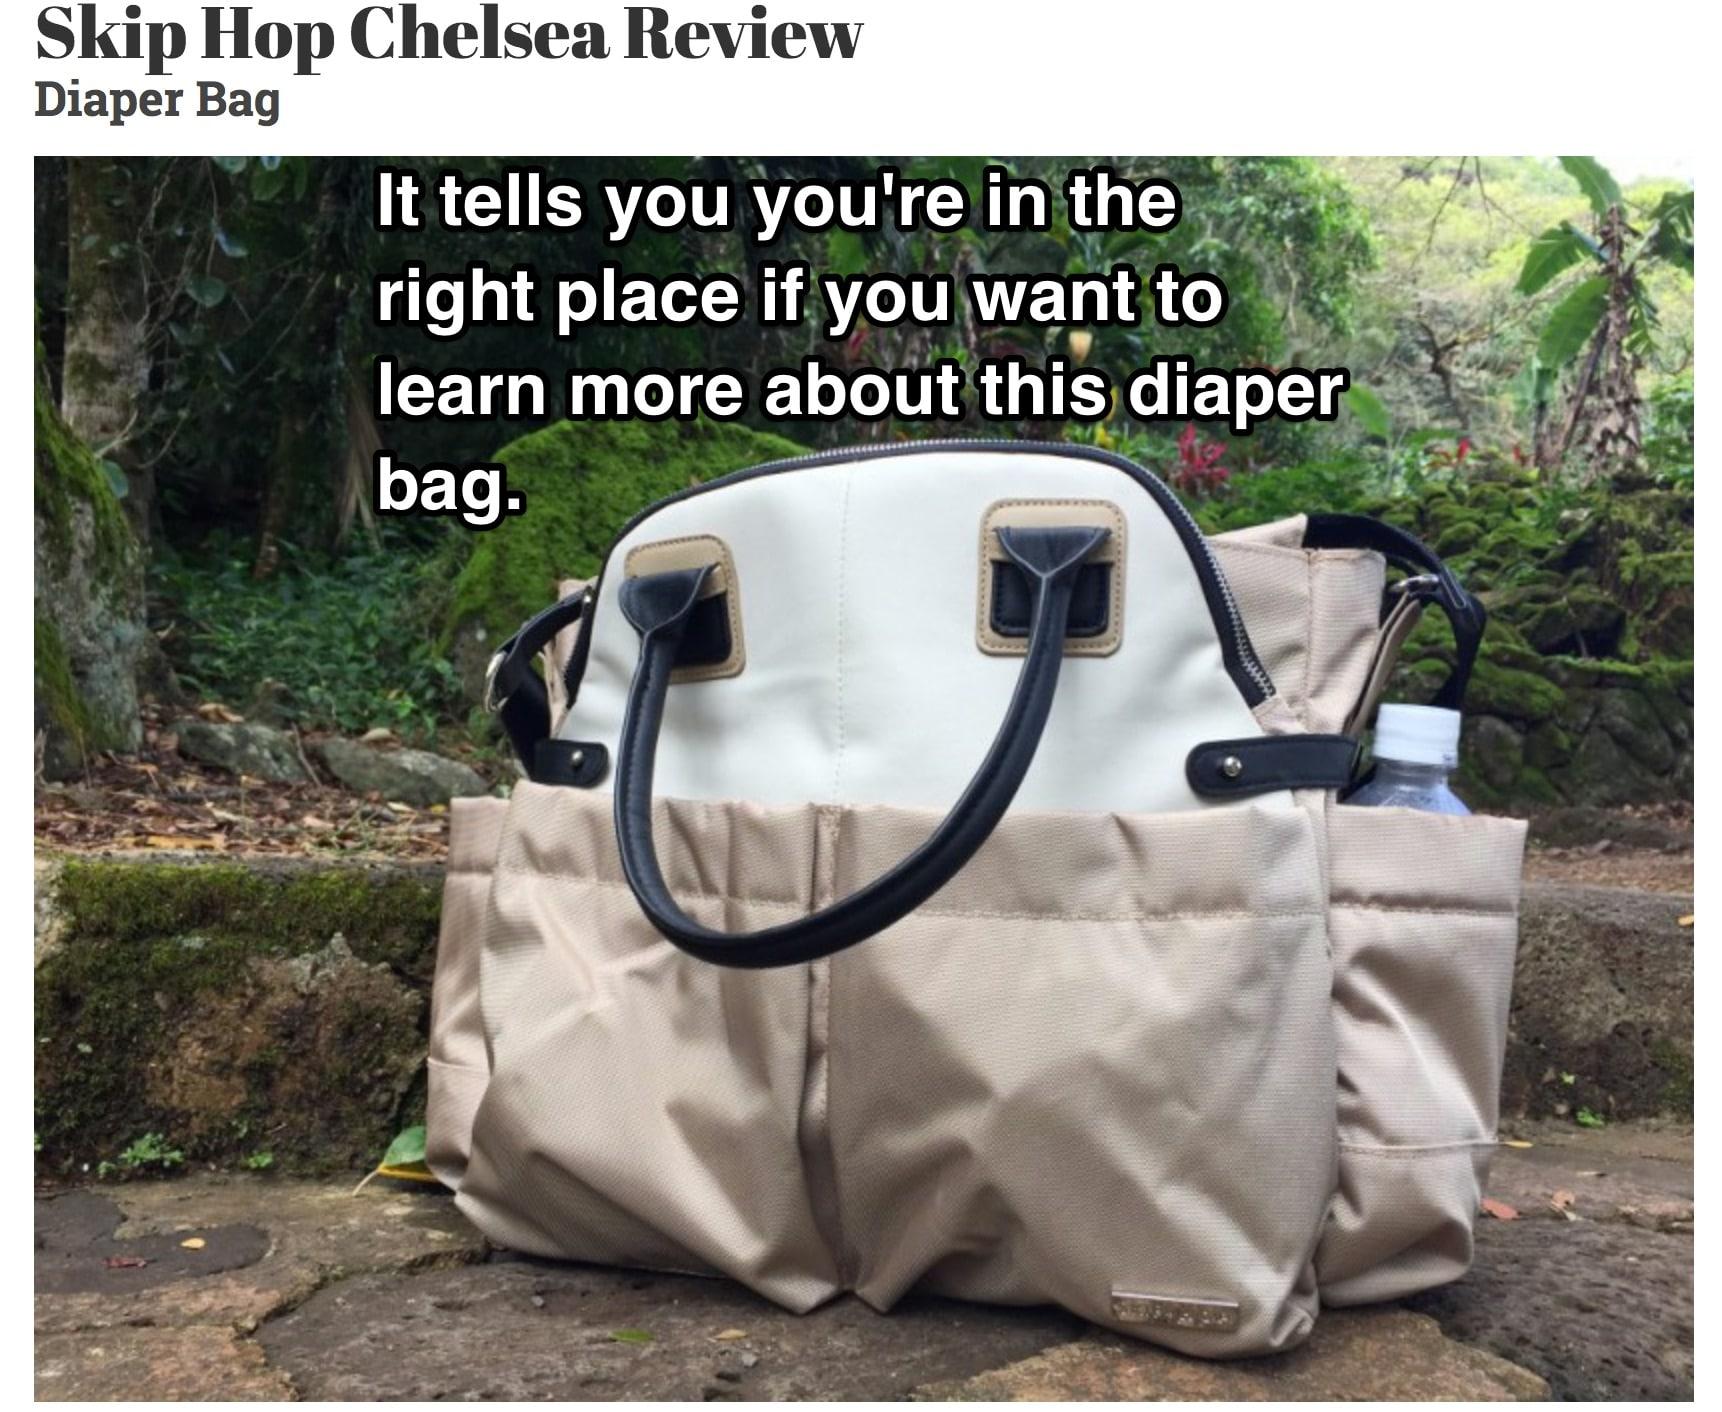 babygearlab-high-quality-headline-image-diaper-bag